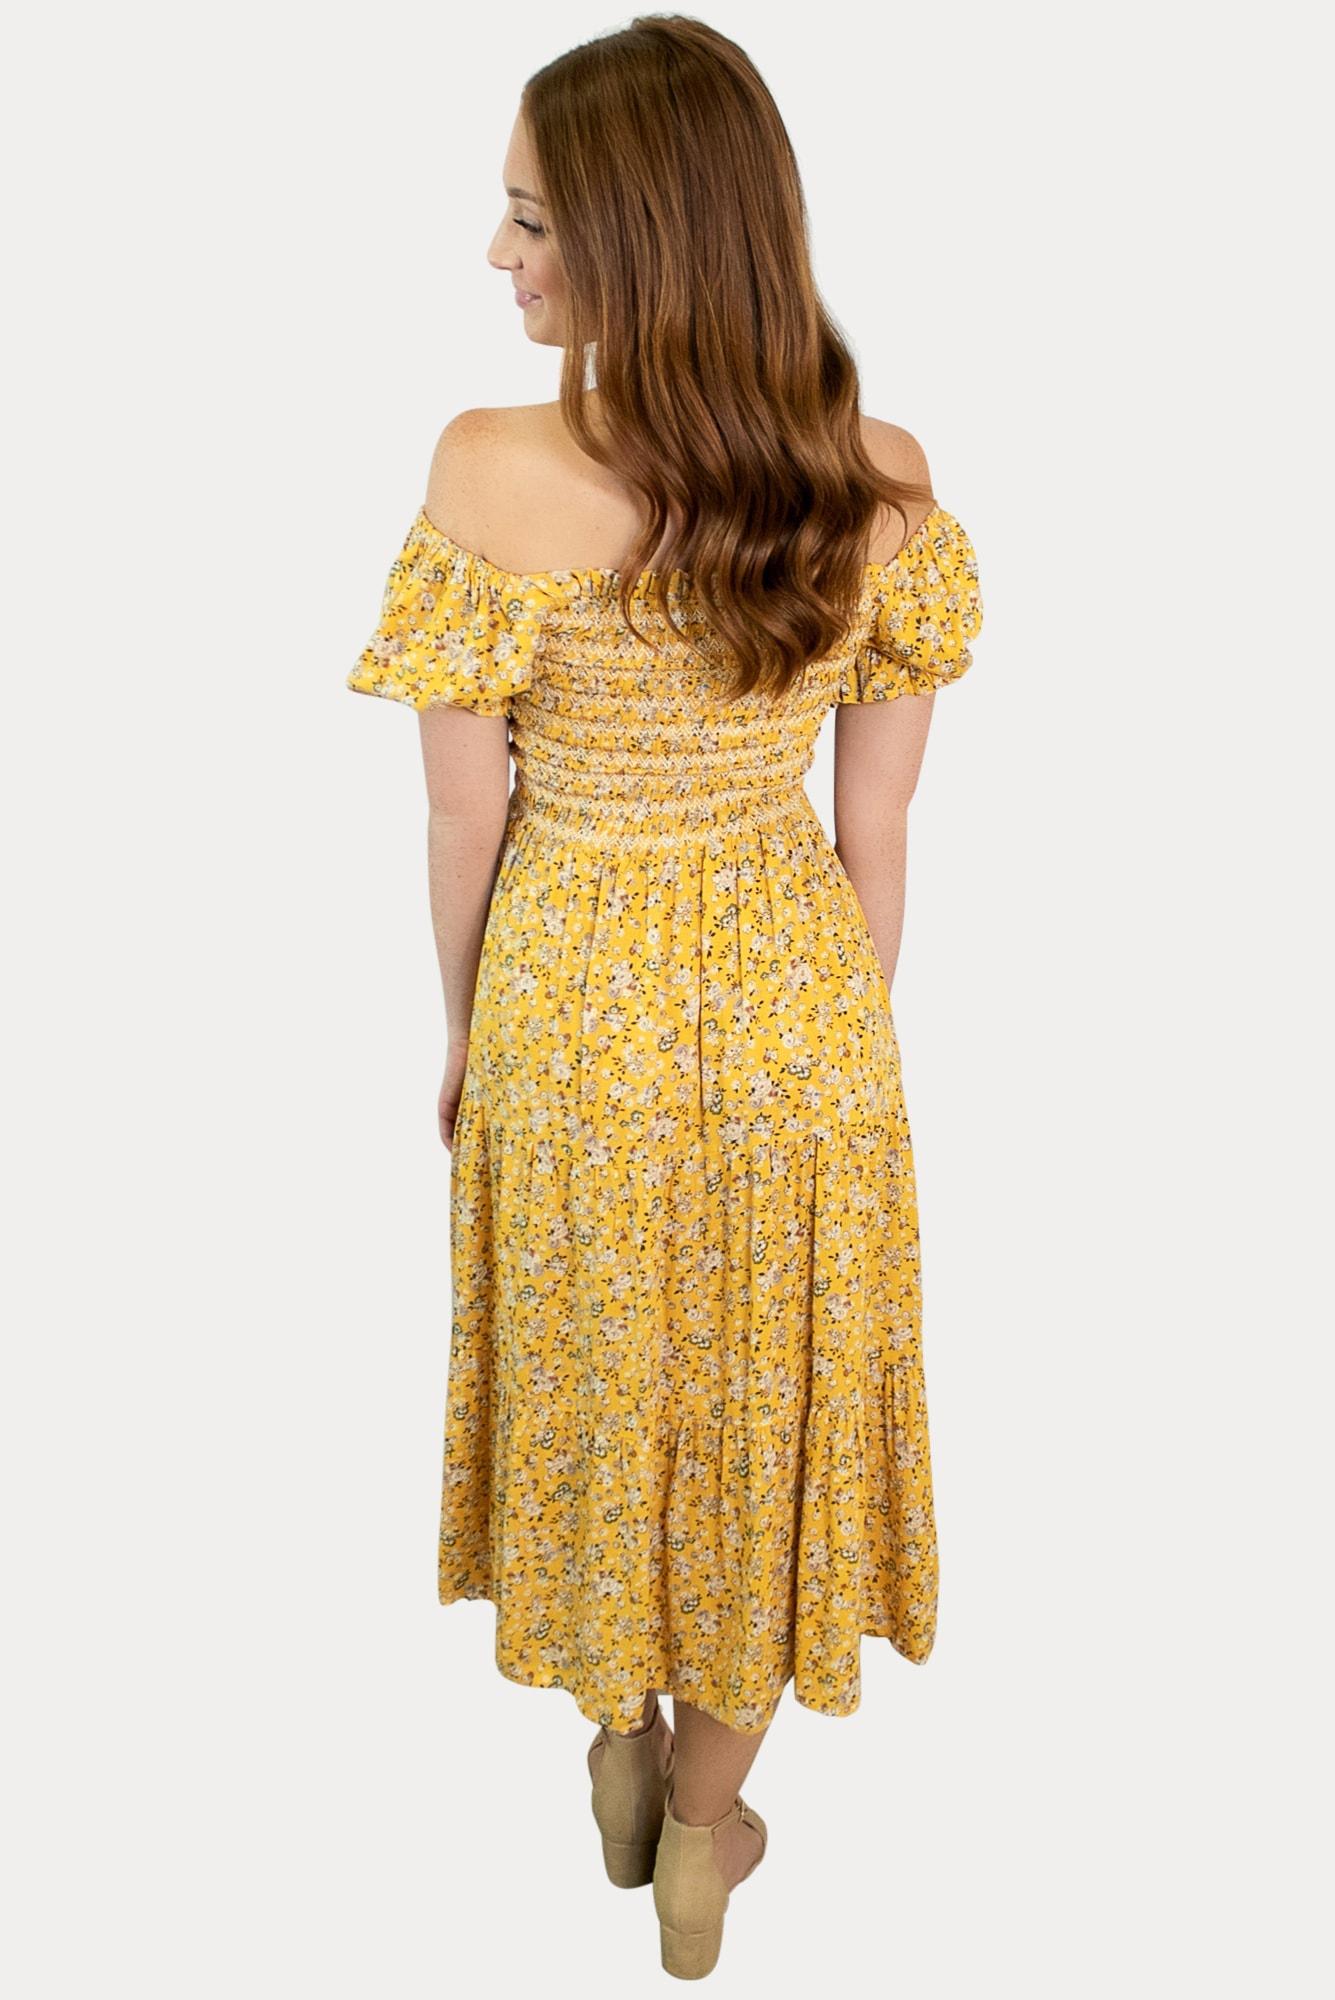 puff sleeve pregnancy dress